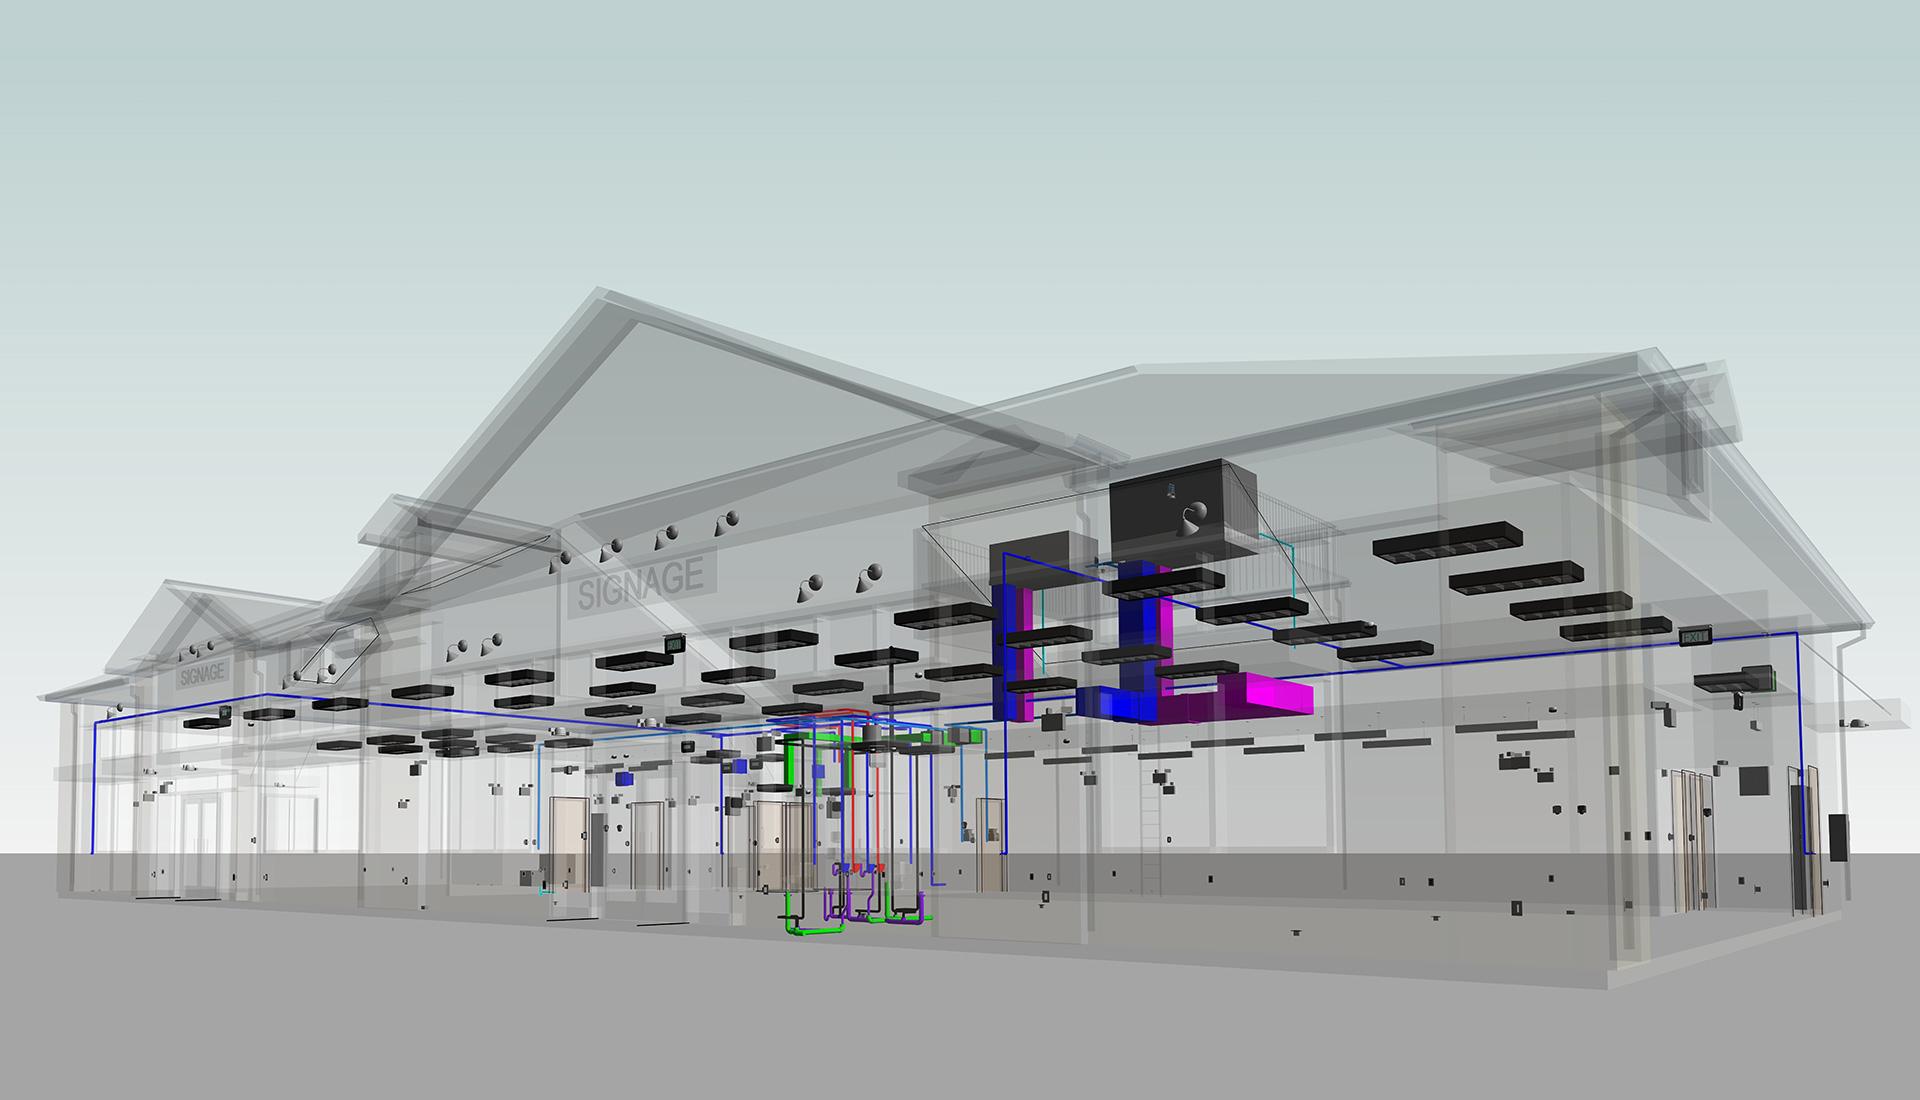 MEP_Revit_Modeling-Silver-lane-Gas-Station_BIM-Project-by-United-BIM